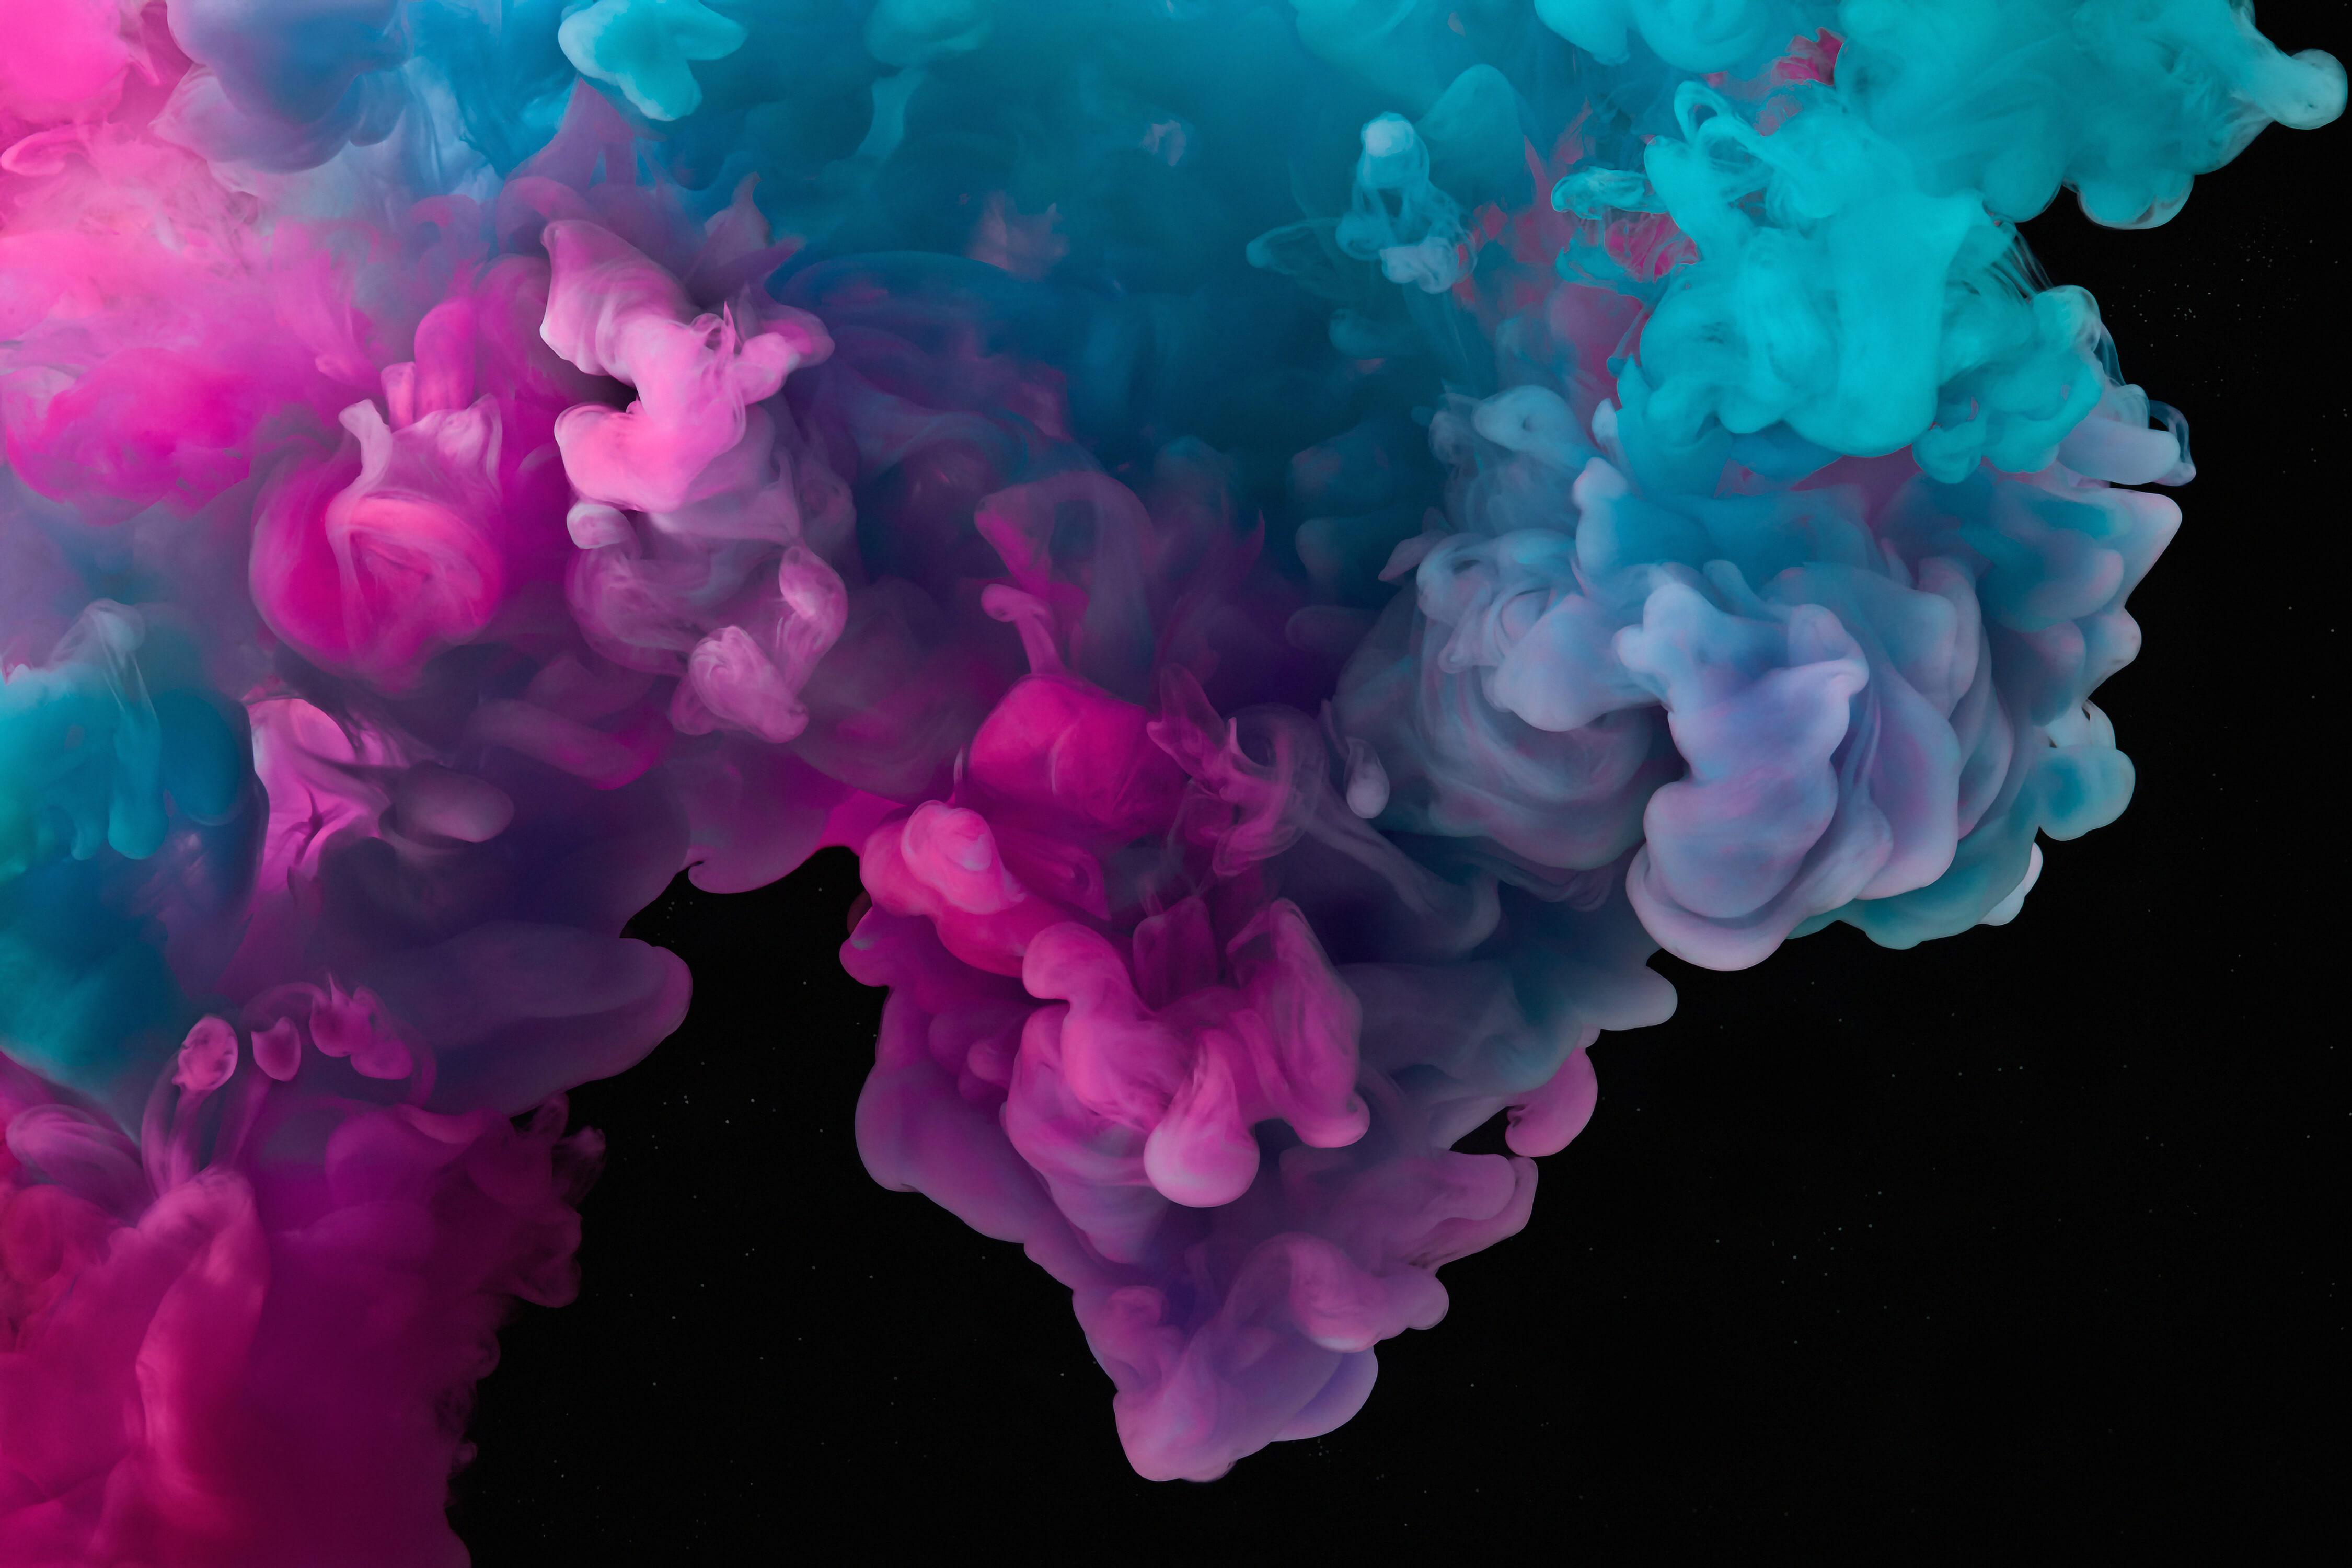 Surface Pro 6 Wallpaperhub